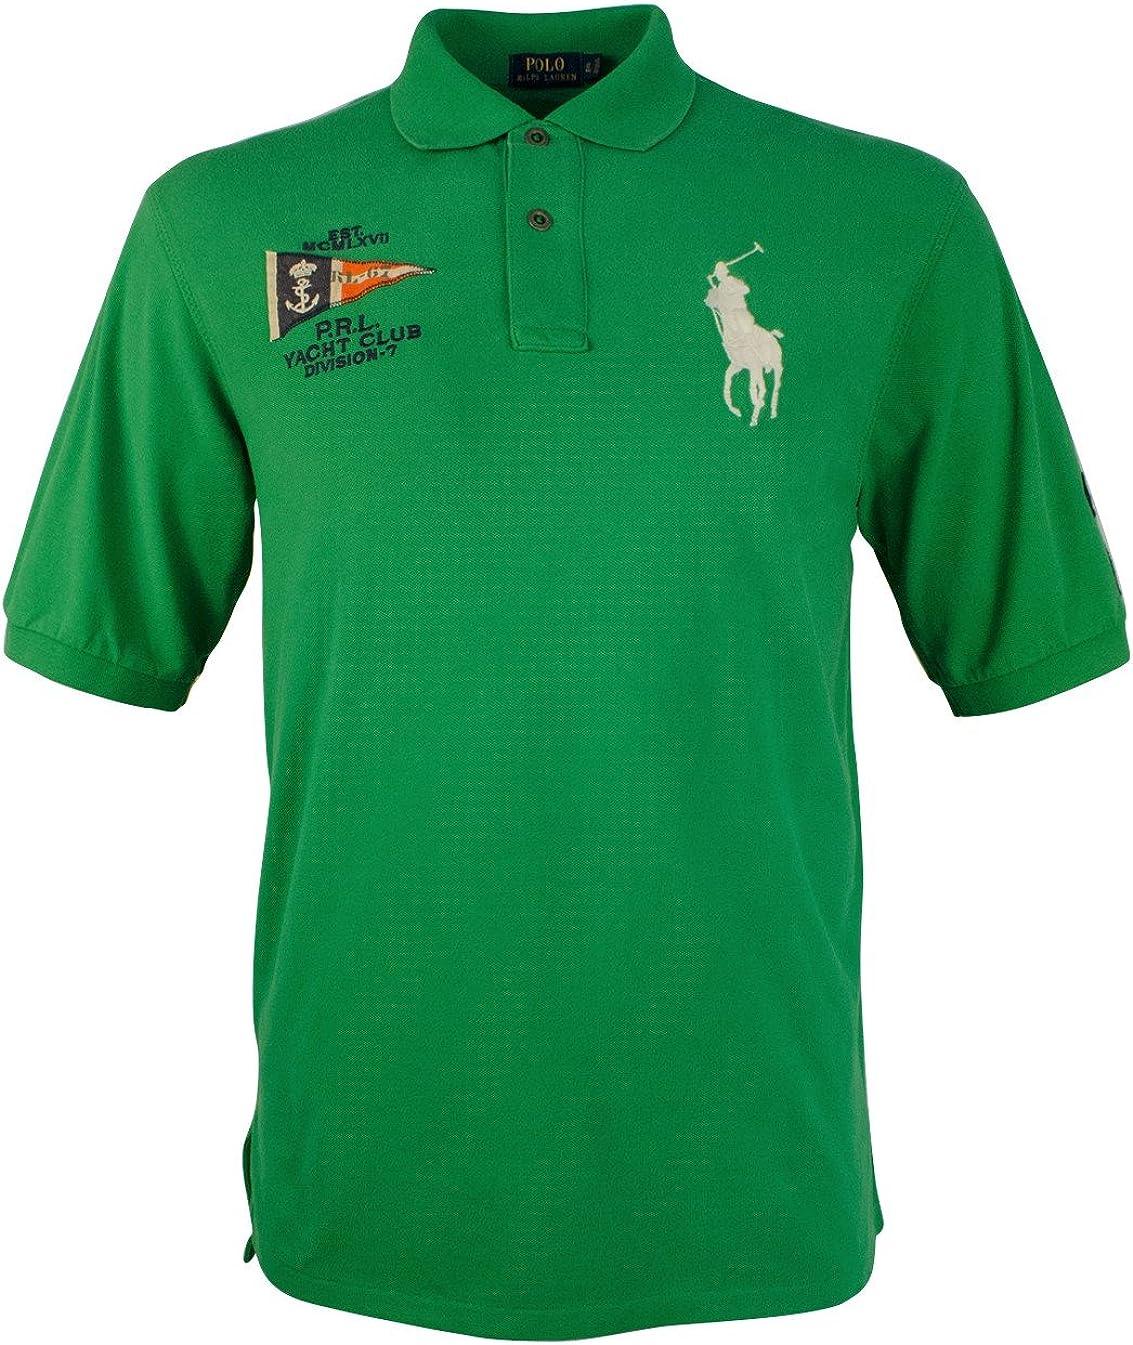 Polo Ralph Lauren Mens Big & Tall 125 Monogram Classic-Fit Polo Shirt